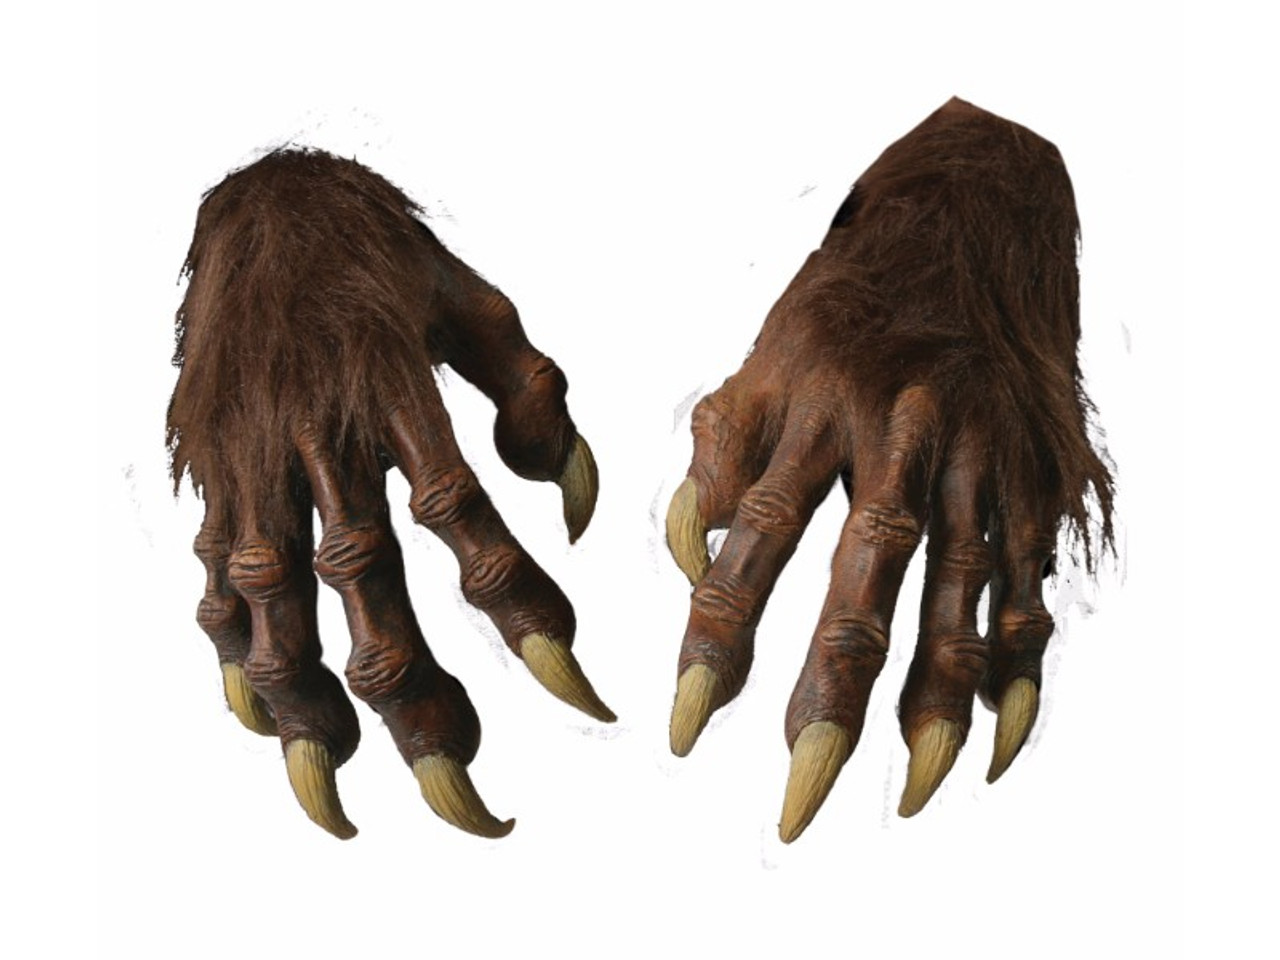 Werewolf Hands Long Fingers And Nails | Houseofhauntz.com